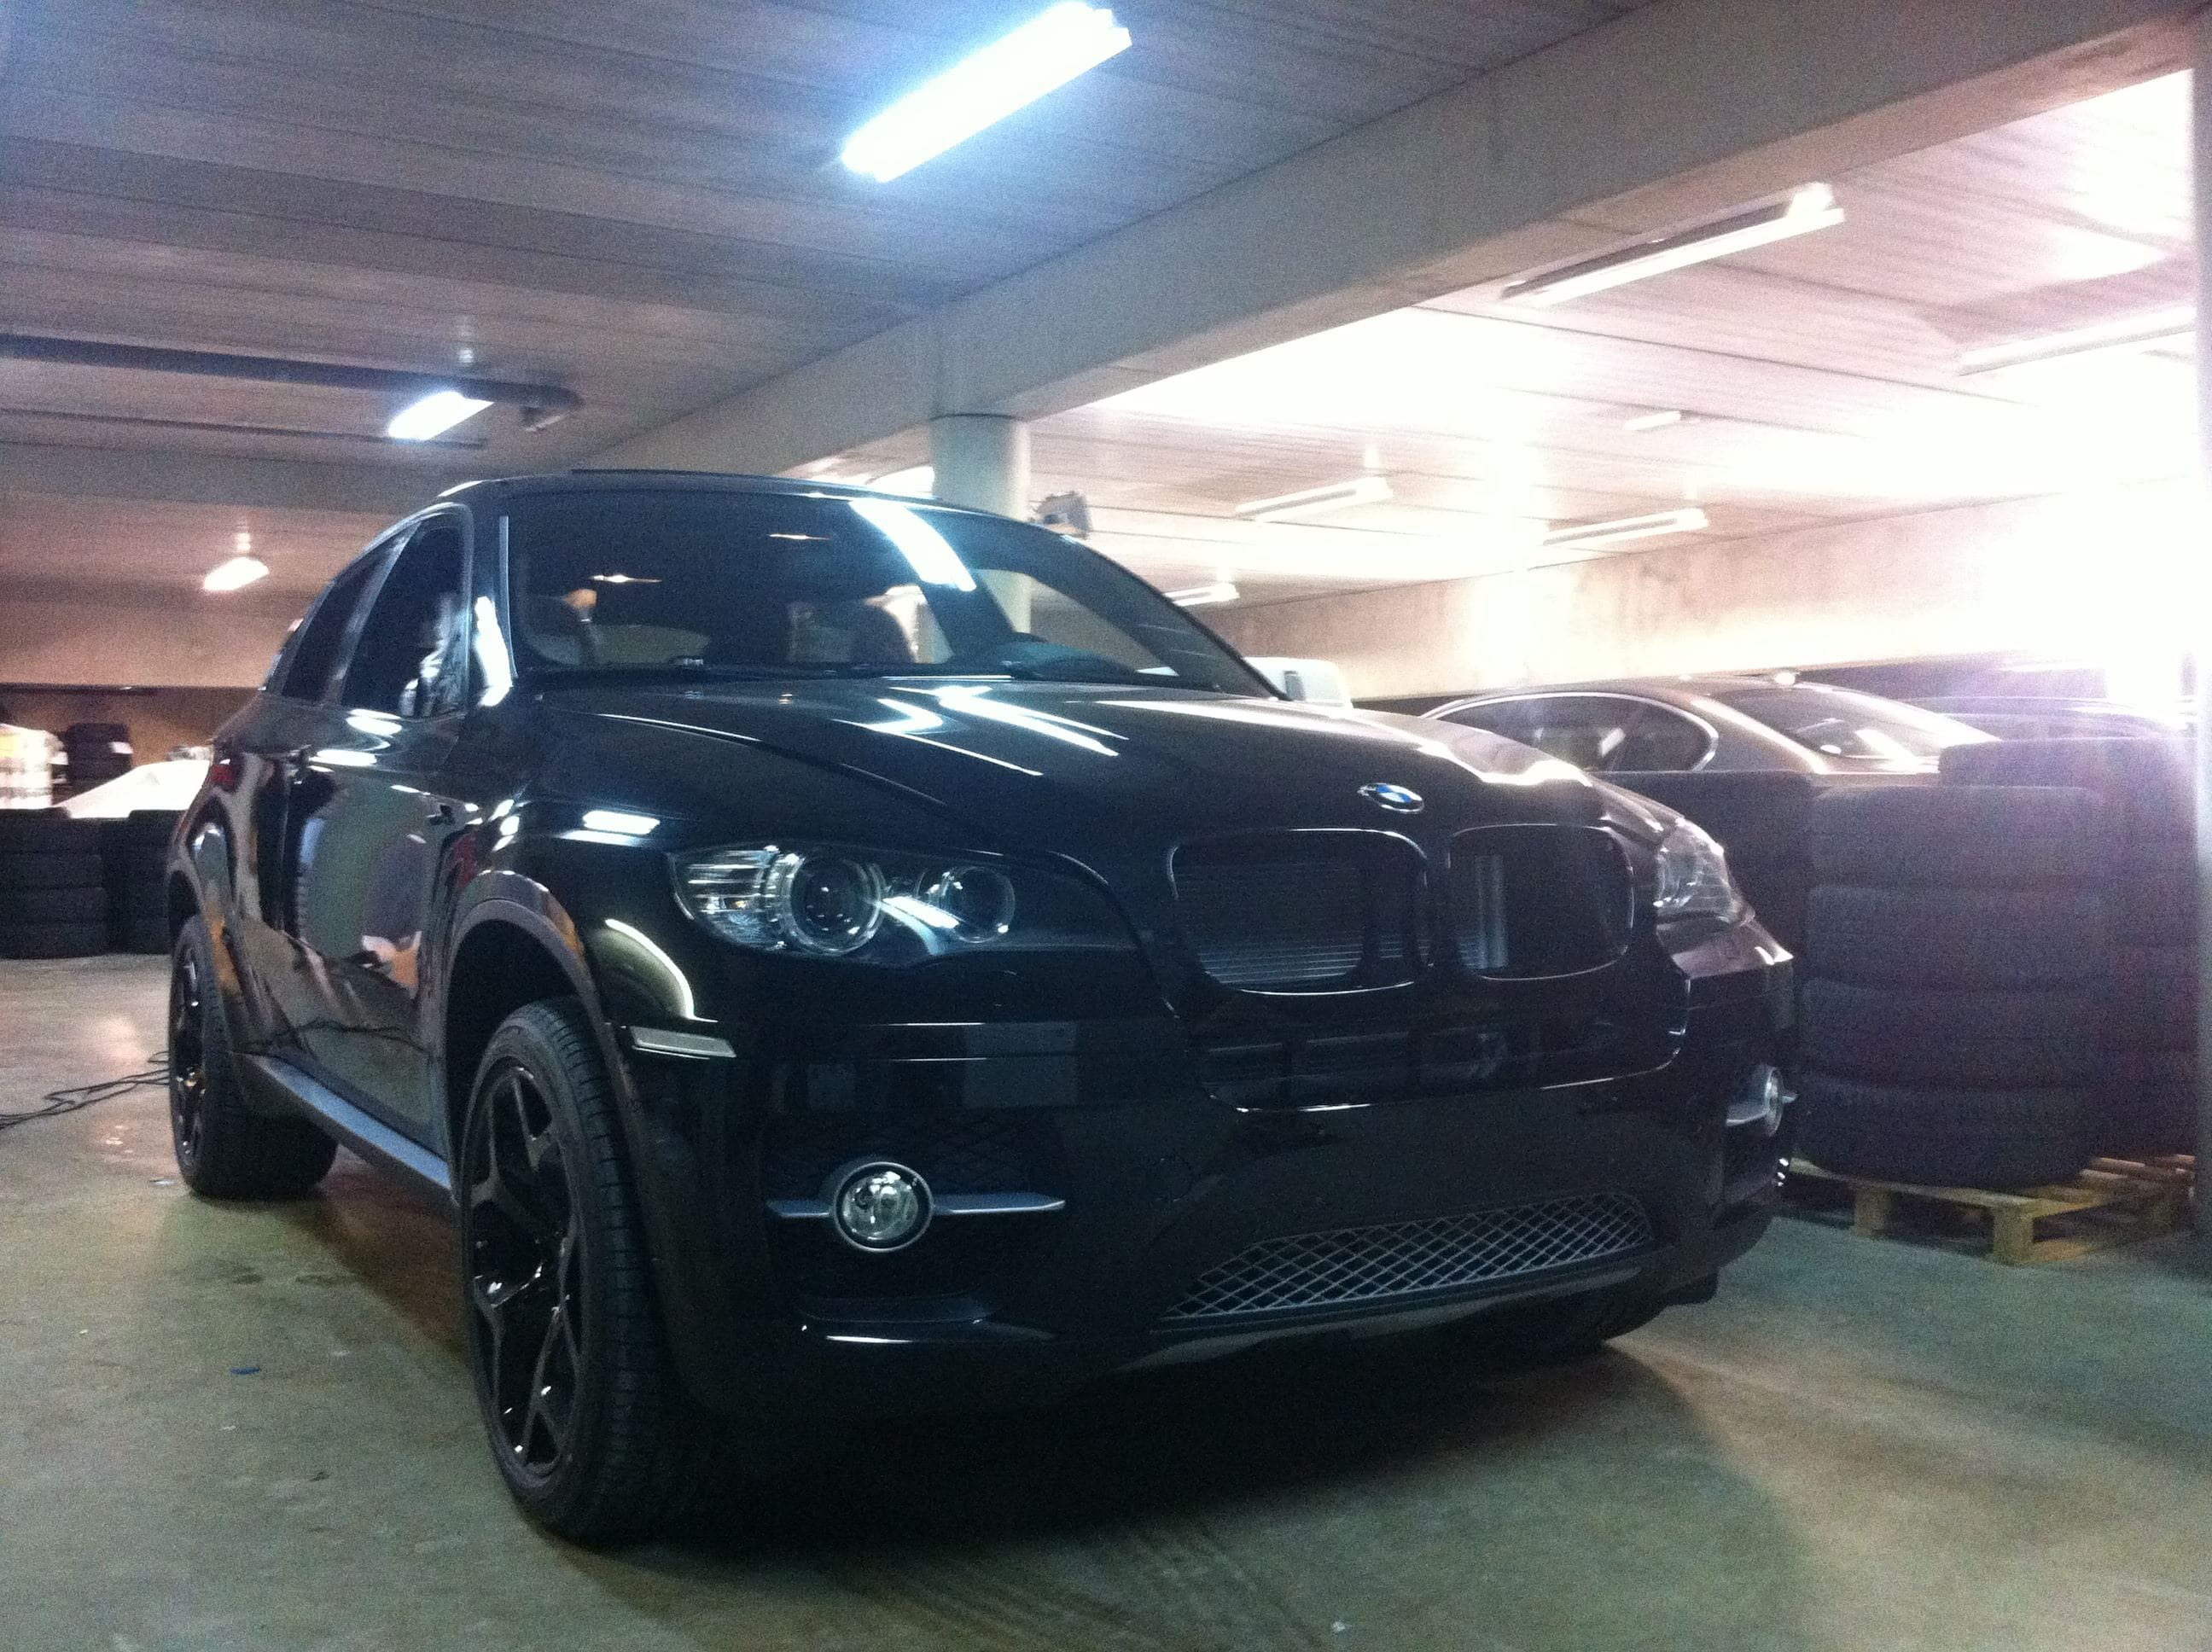 BMW X6 met Mat Zwarte Wrap, Carwrapping door Wrapmyride.nu Foto-nr:5493, ©2020